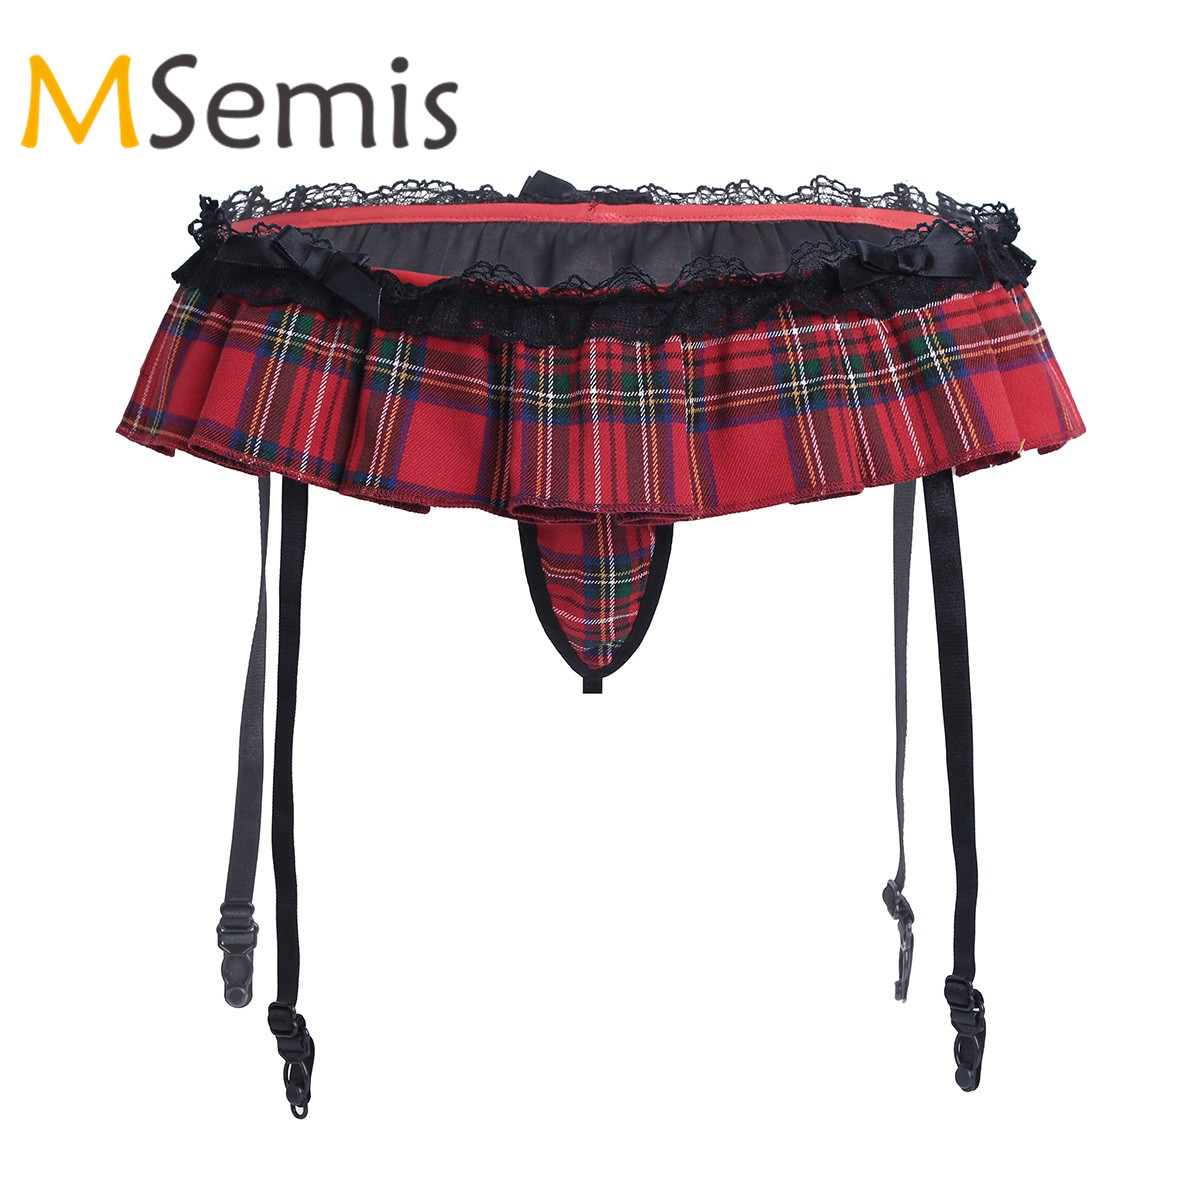 Women's Lingerie Underwear Plaid Little Skirted G-string Thong Gwith Sock Garter Belt Holder Fastener Suspender Thong Panties